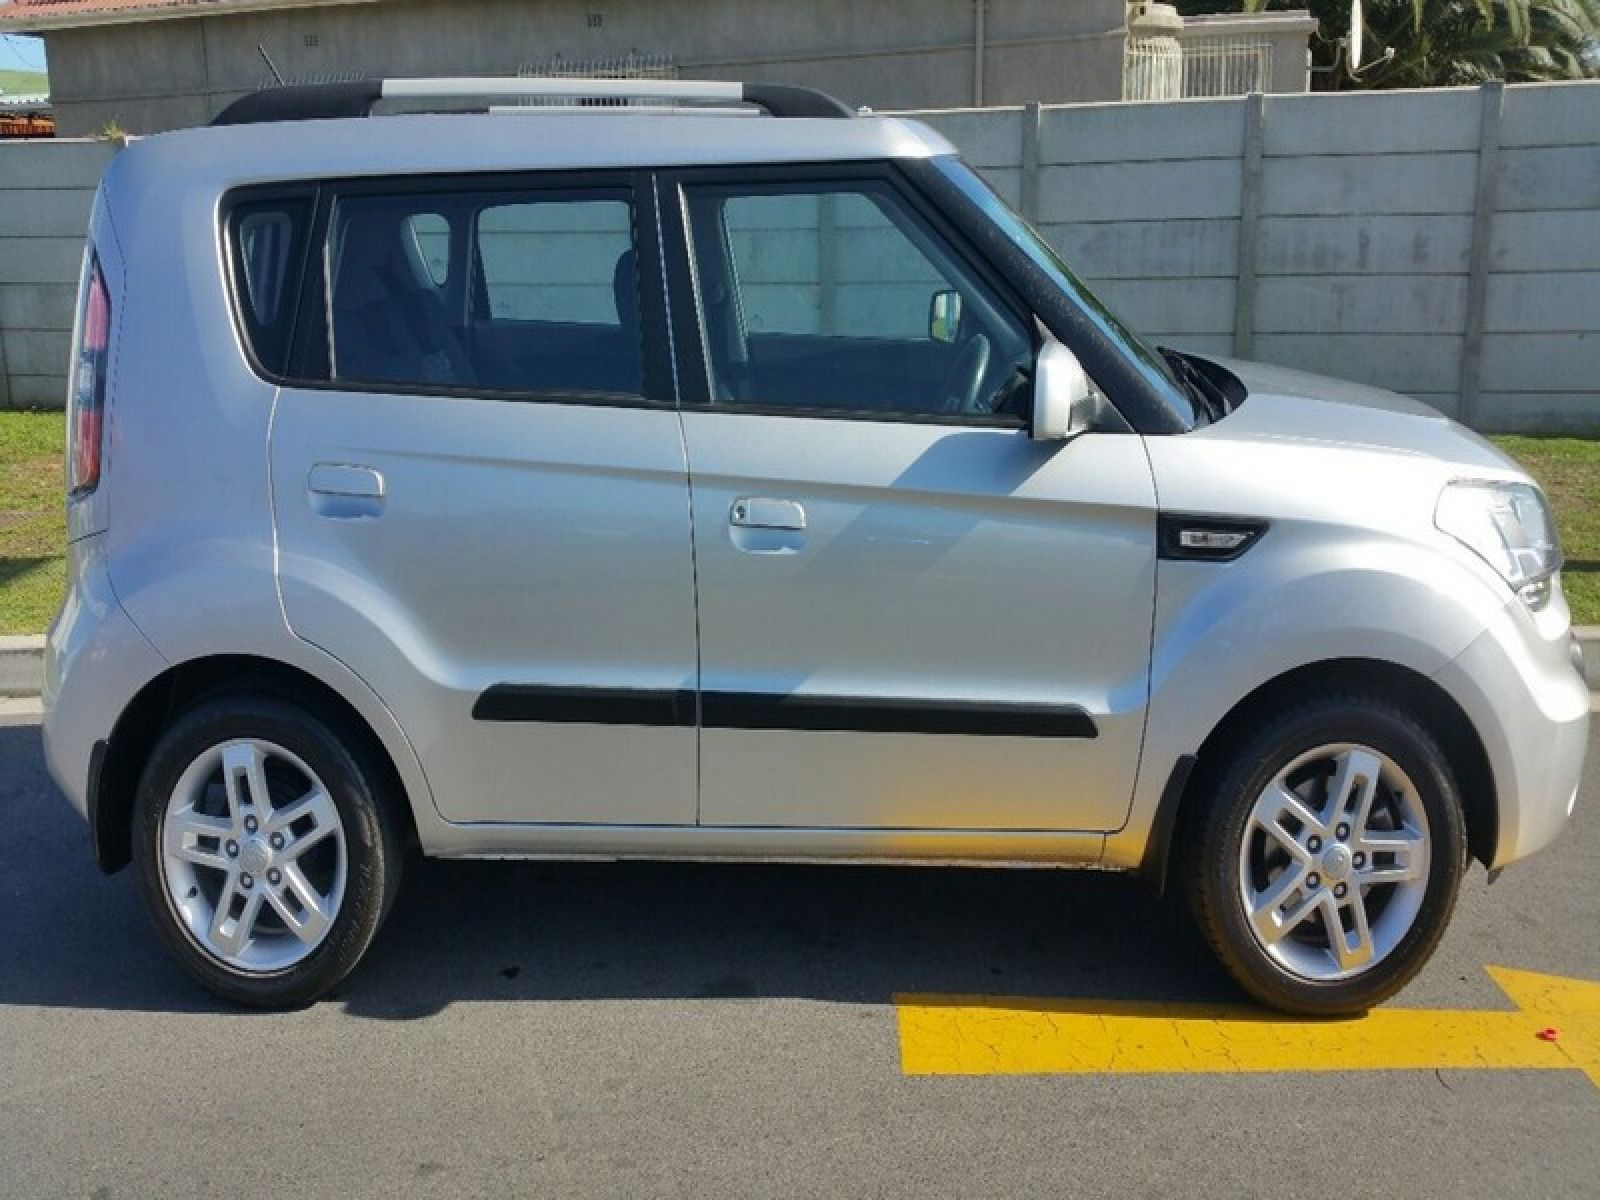 news unveiled soul ev chicago electric h show auto at blue kia car